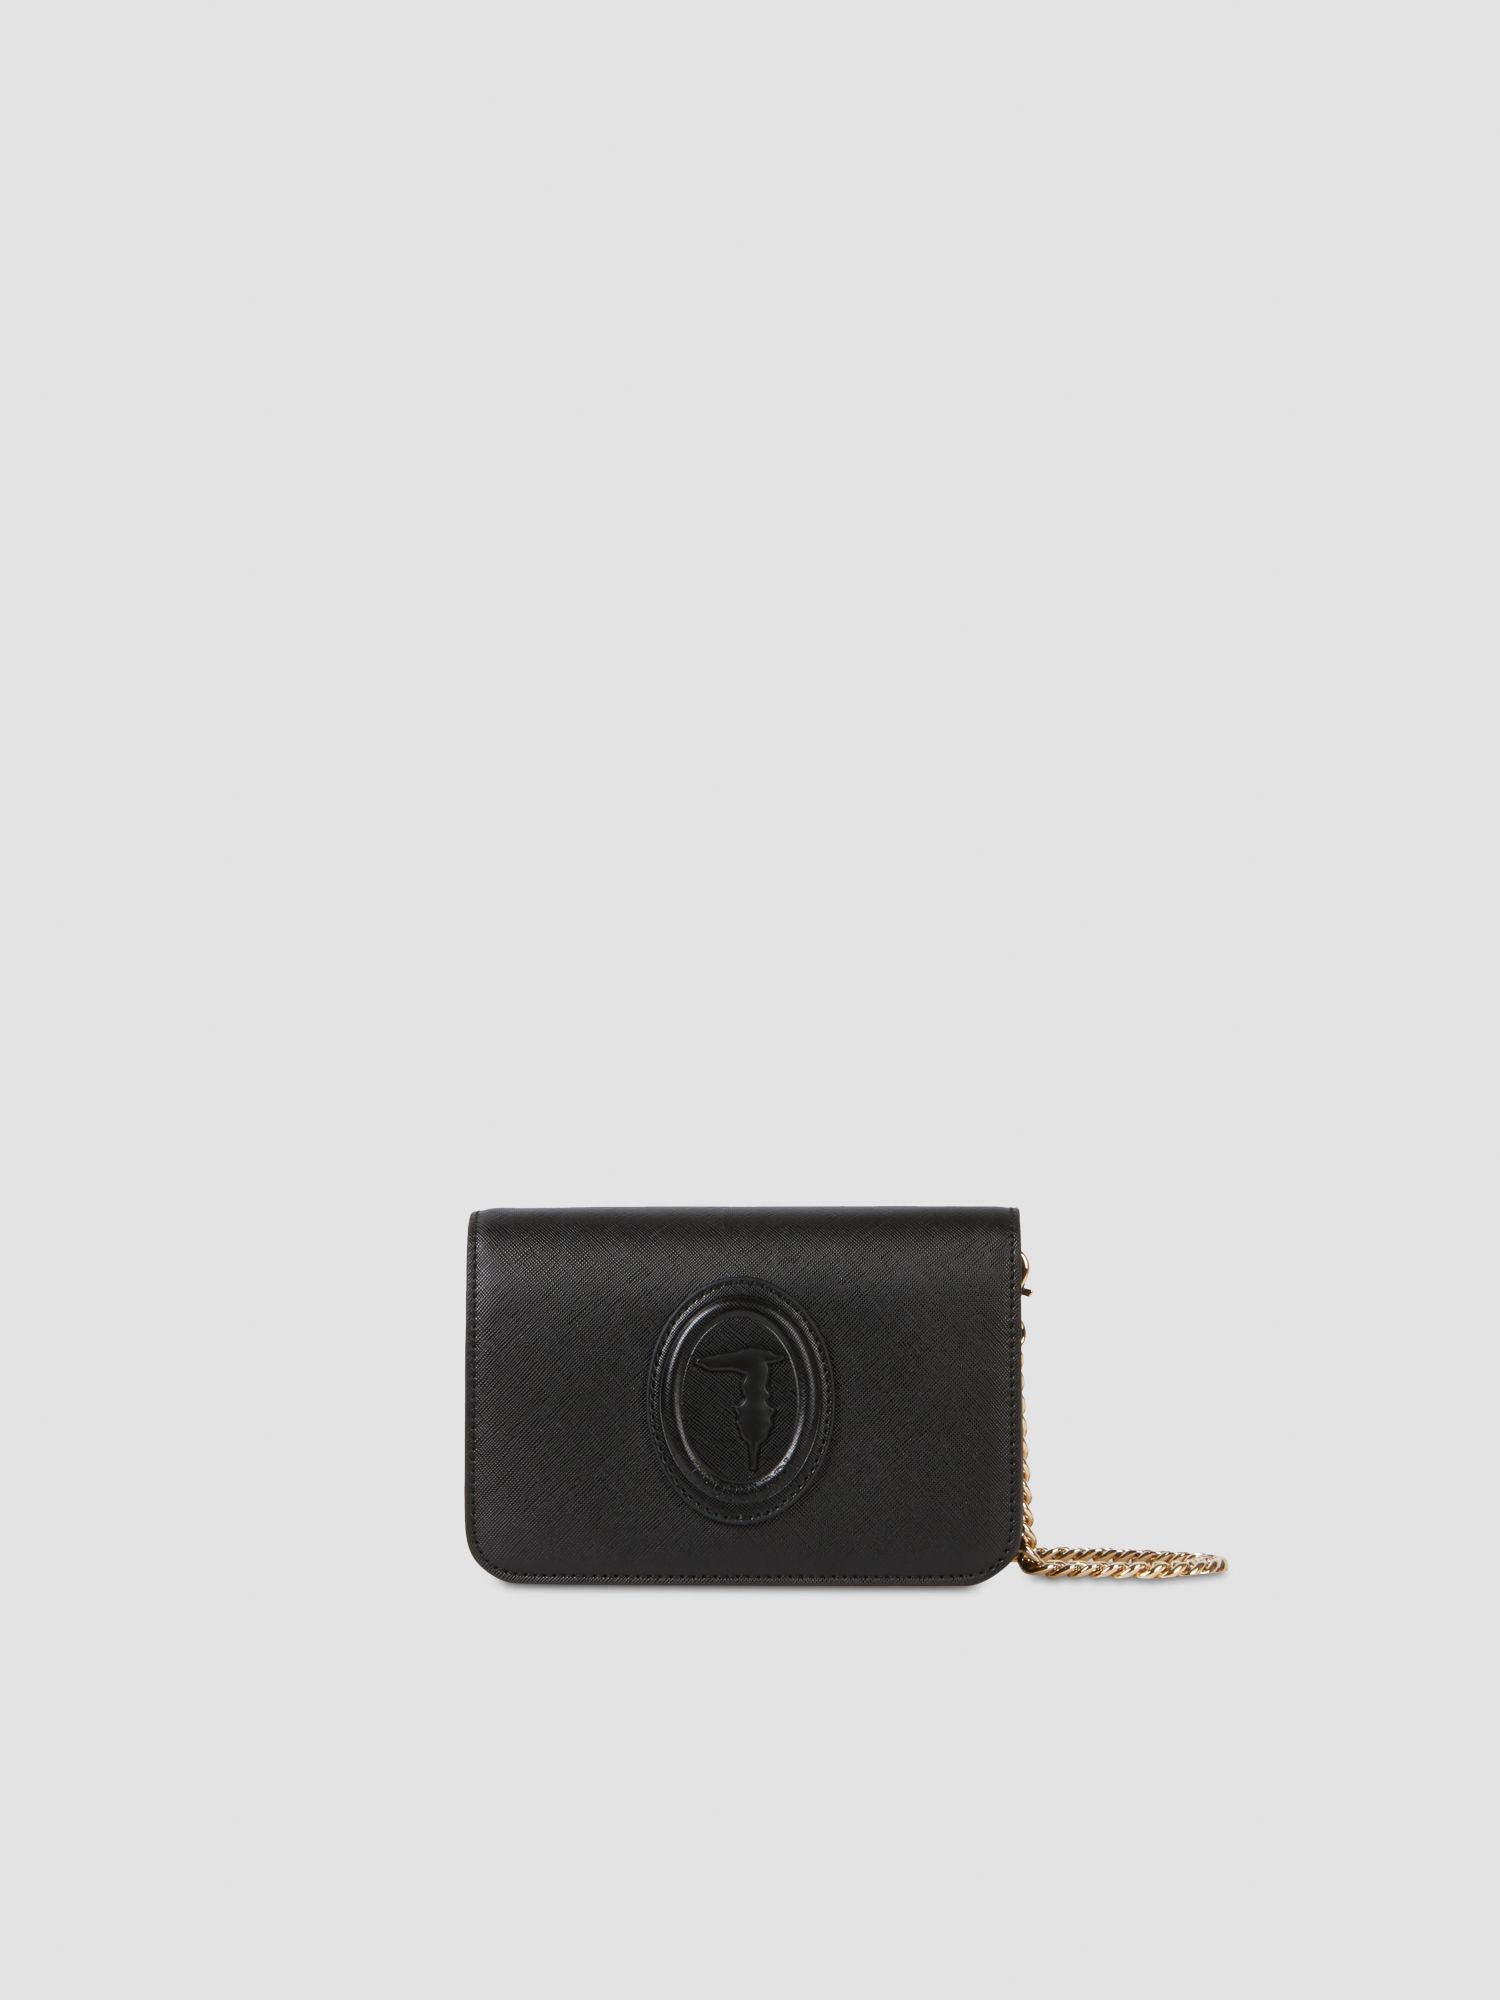 Faux saffiano leather 1 clutch TRUSSARDI JEANS 50 01 8051932438746 F